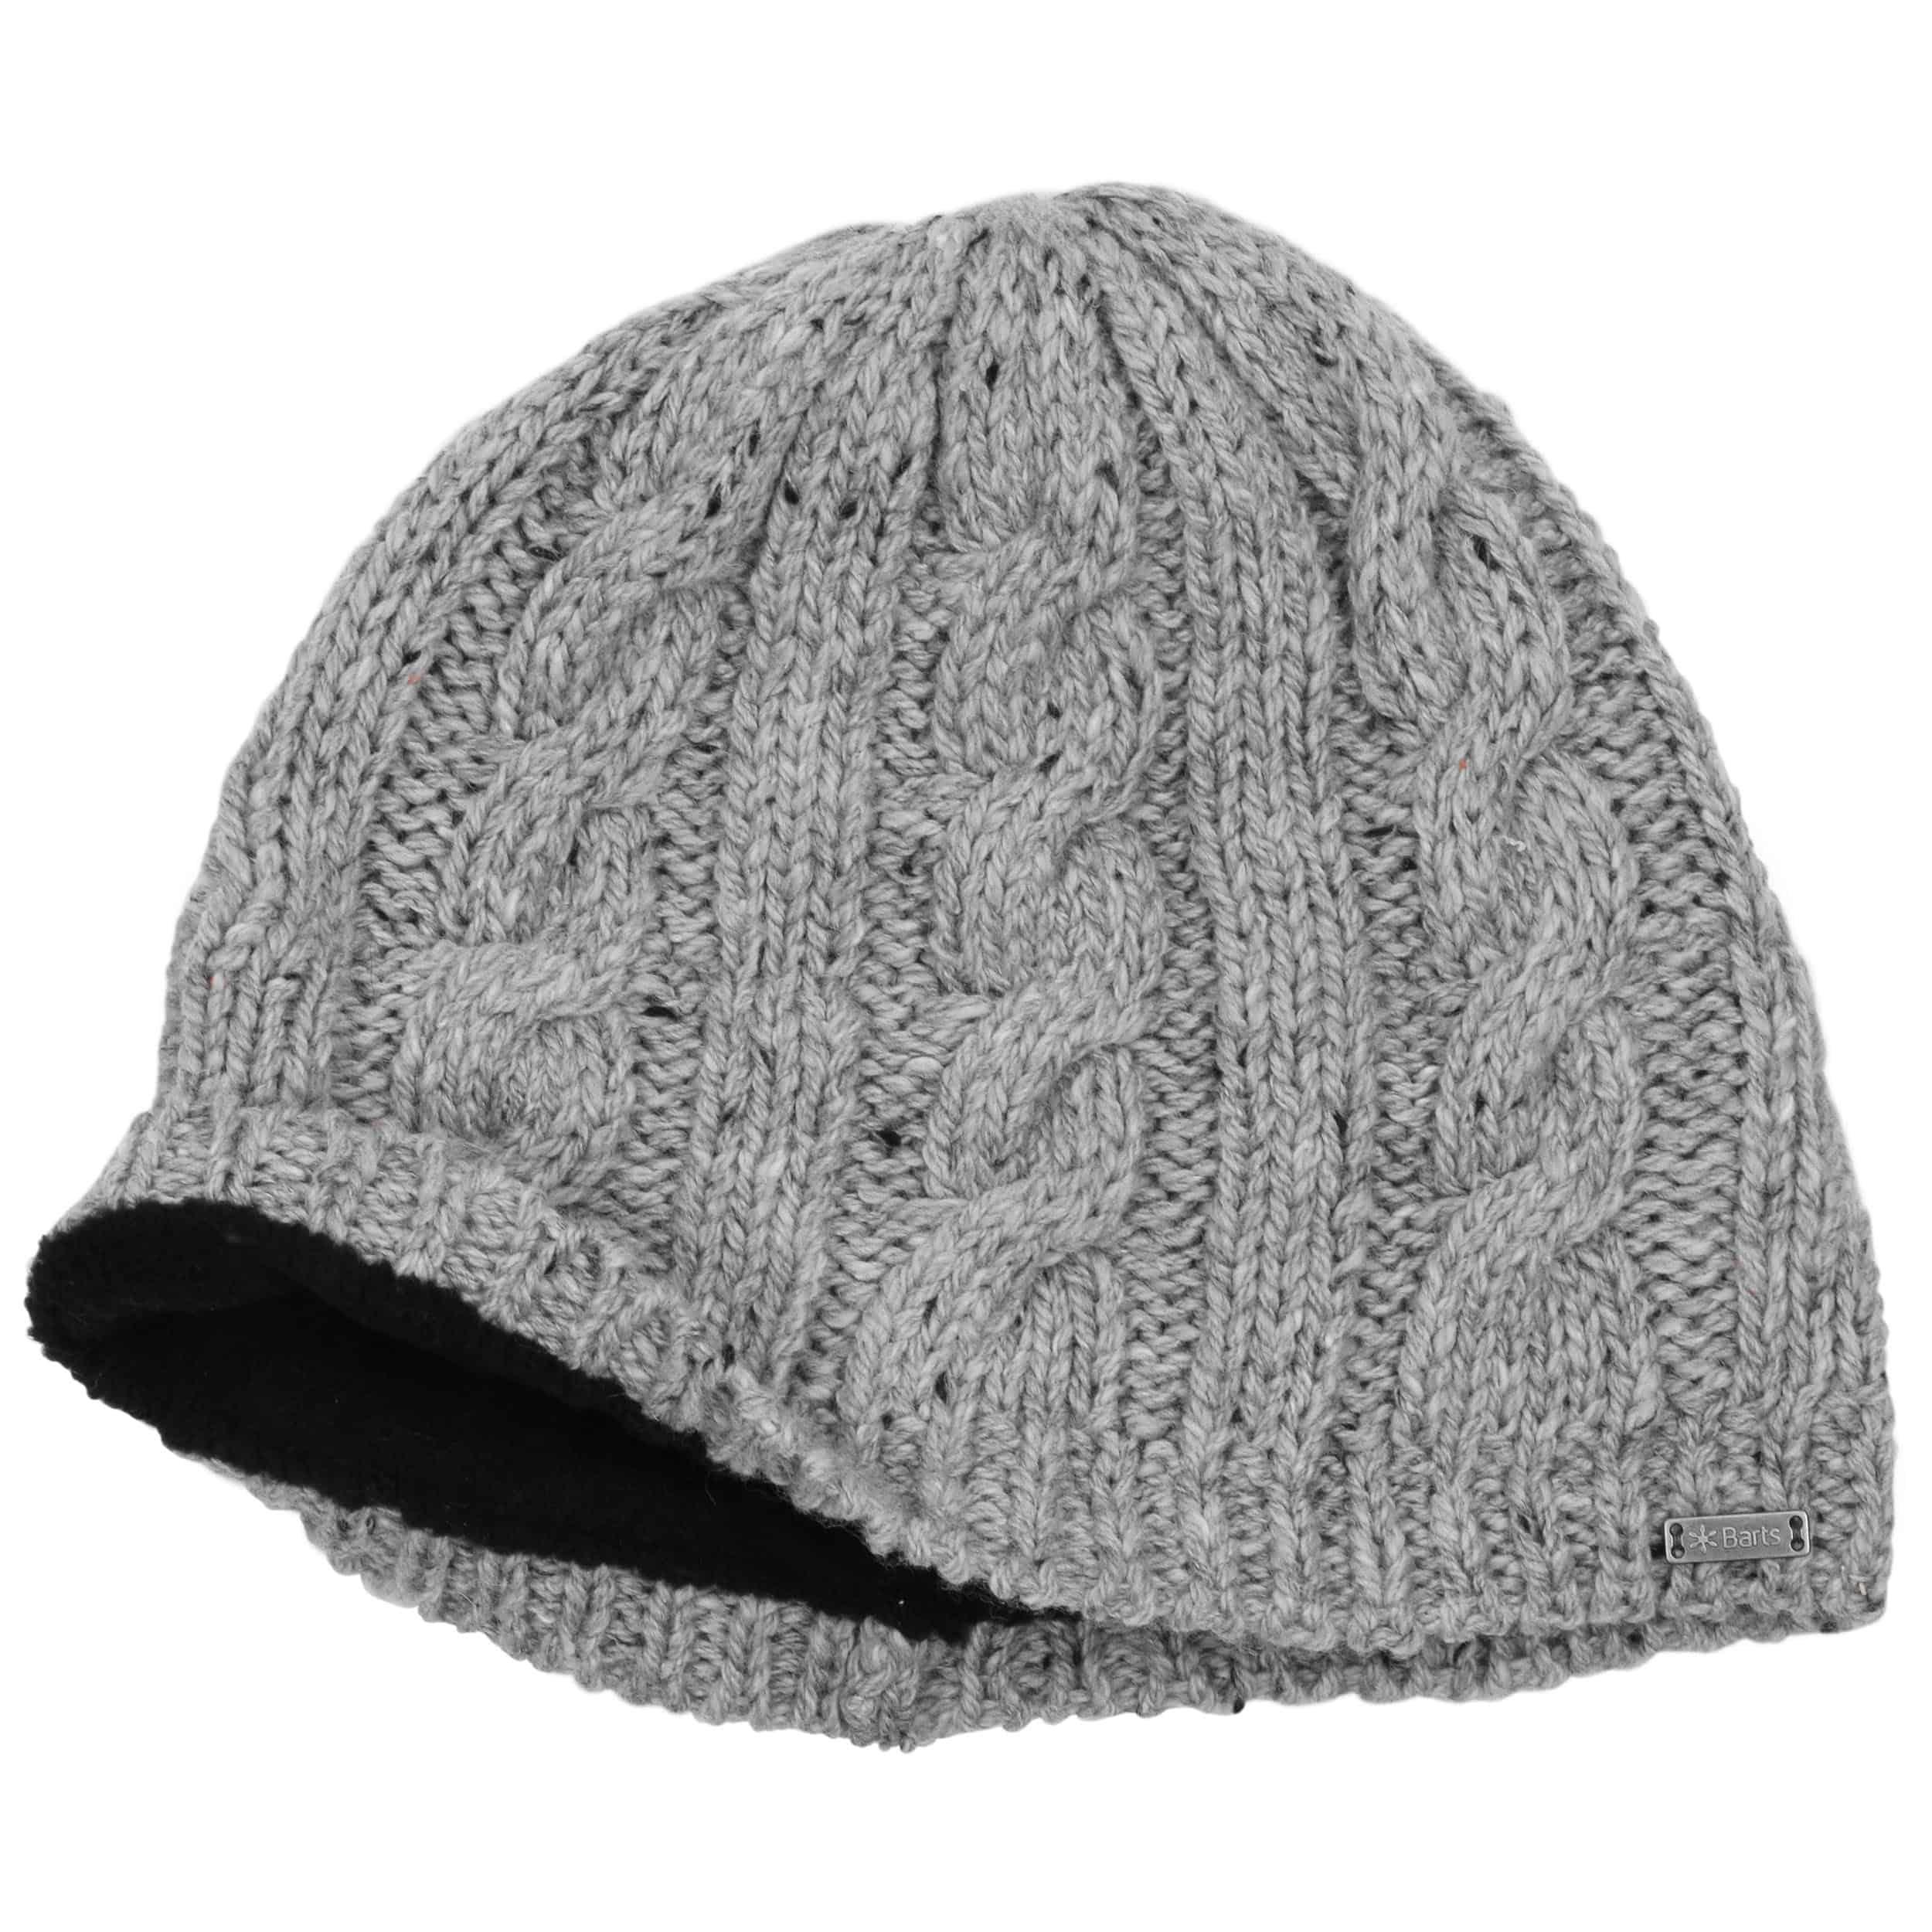 d8e2f4f408515 Gorro Hombre de Punto Gus by Barts - Gorros - sombreroshop.es